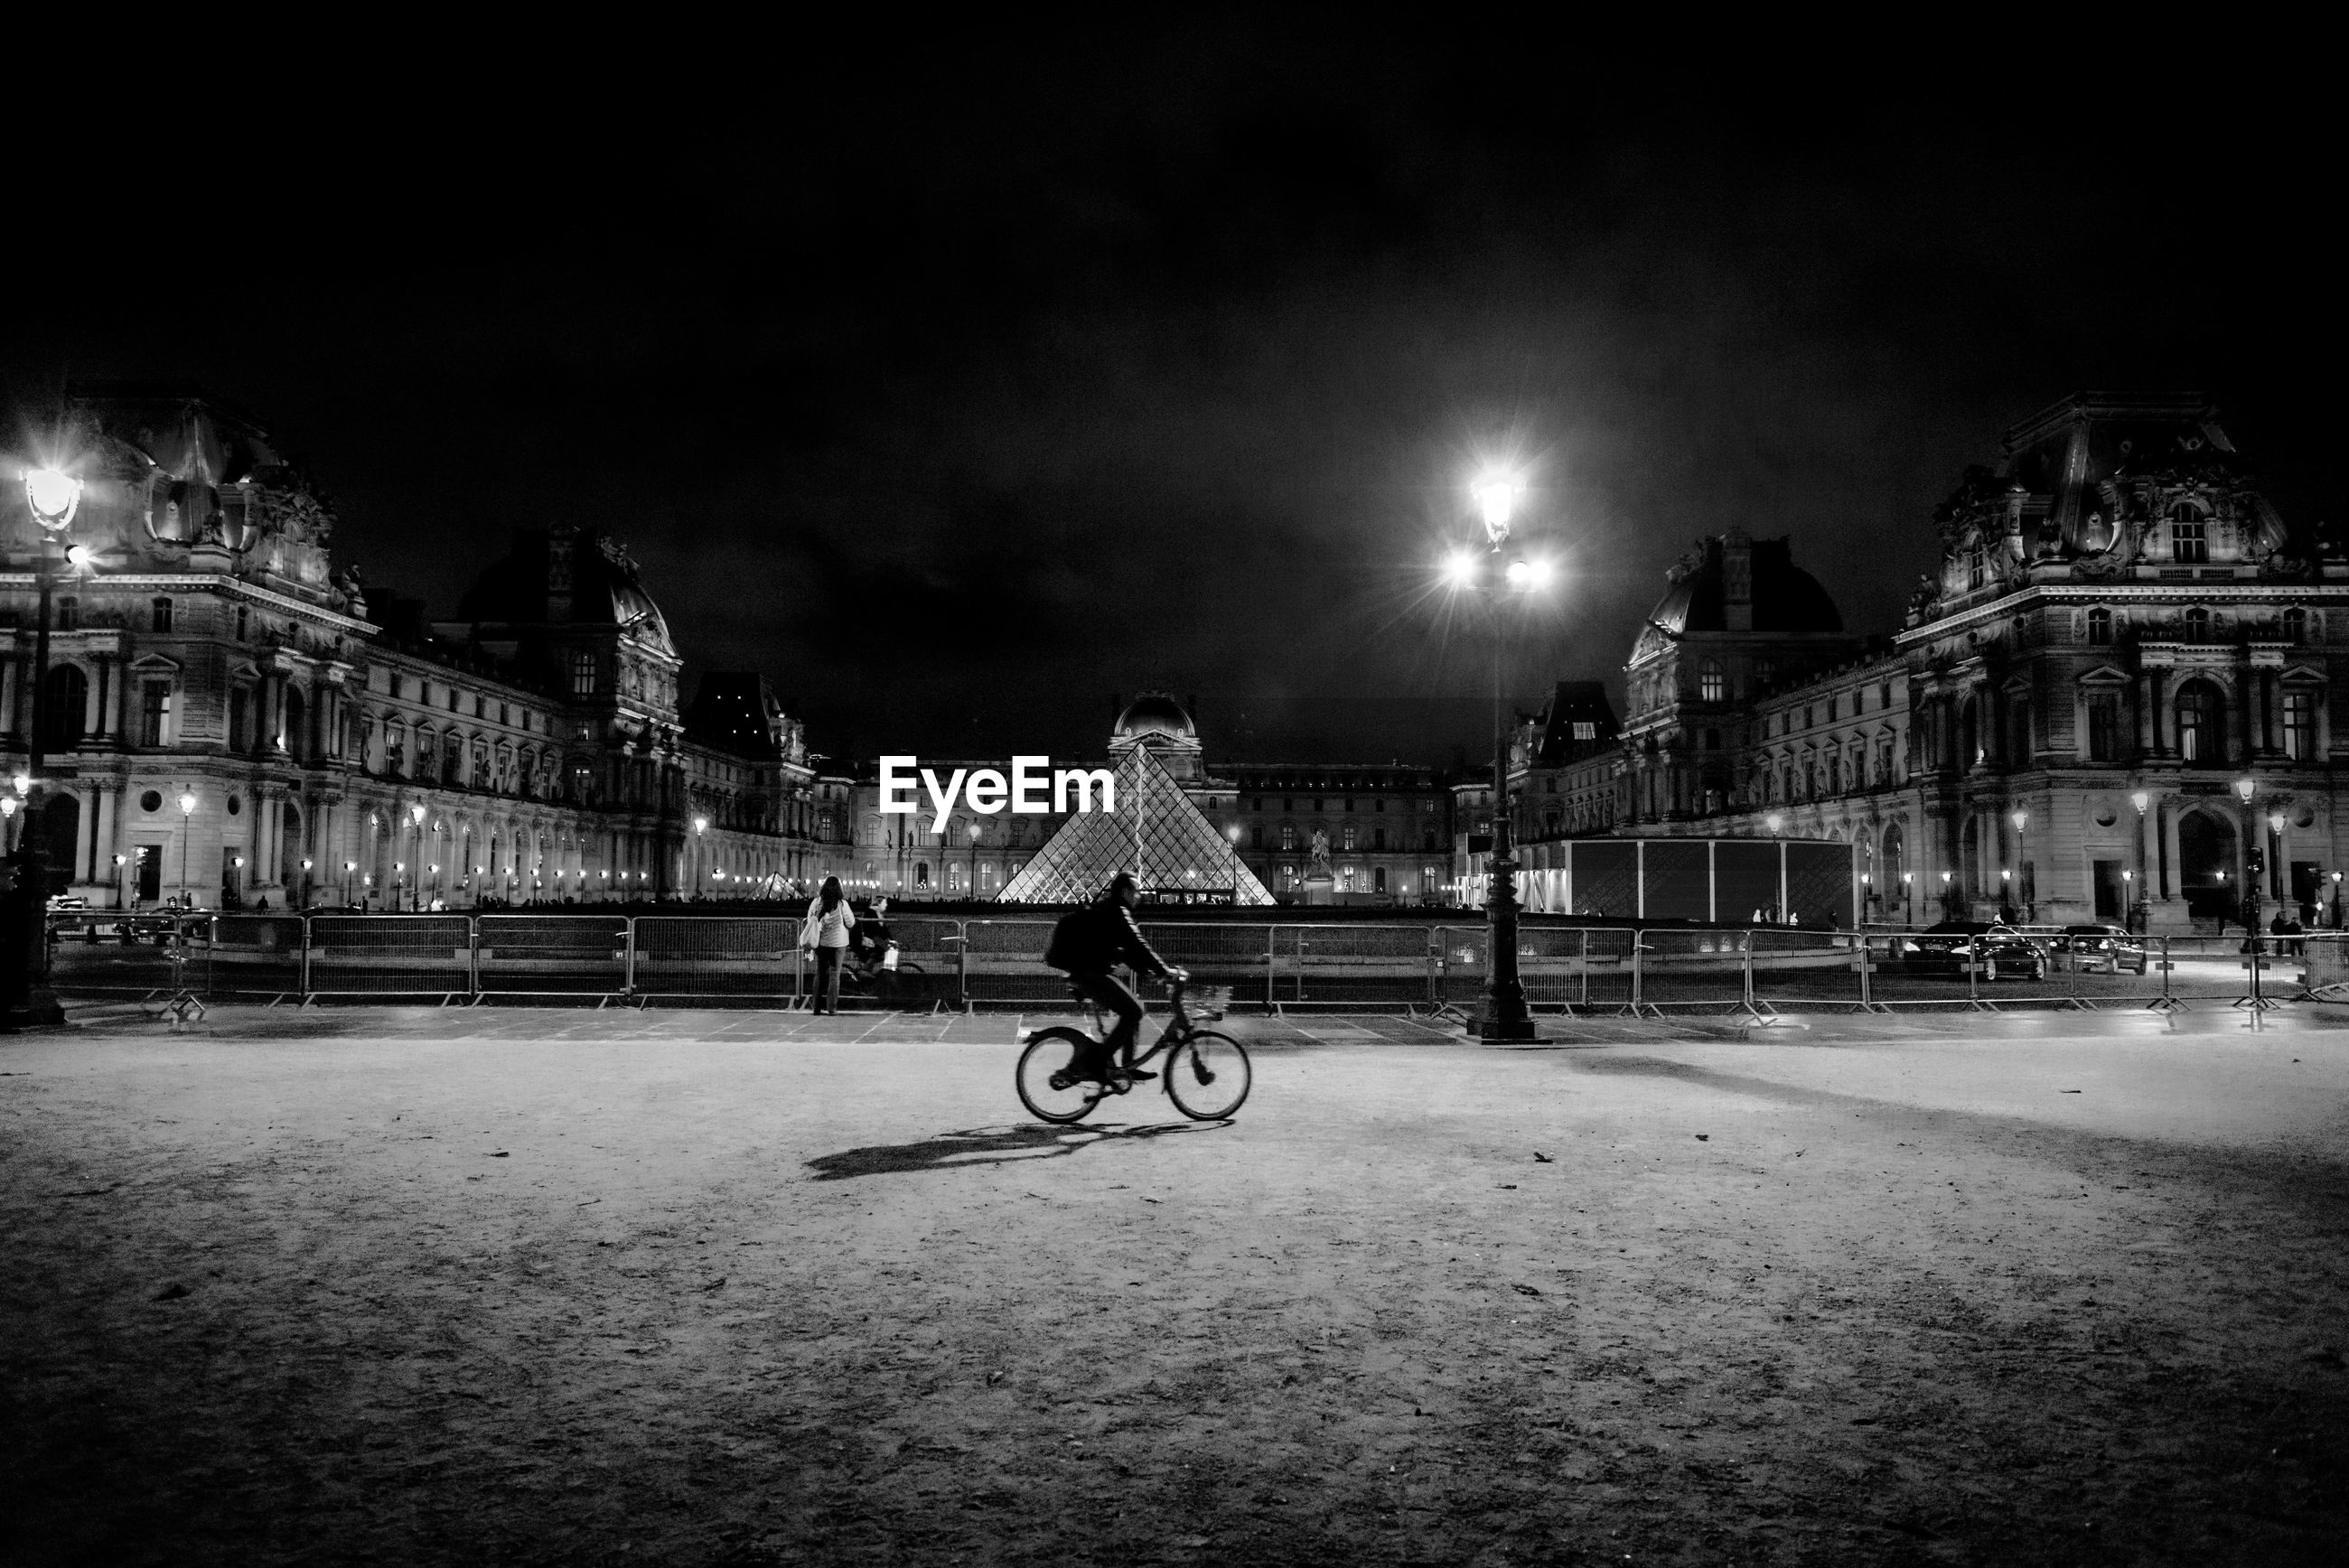 Man cycling on street at night